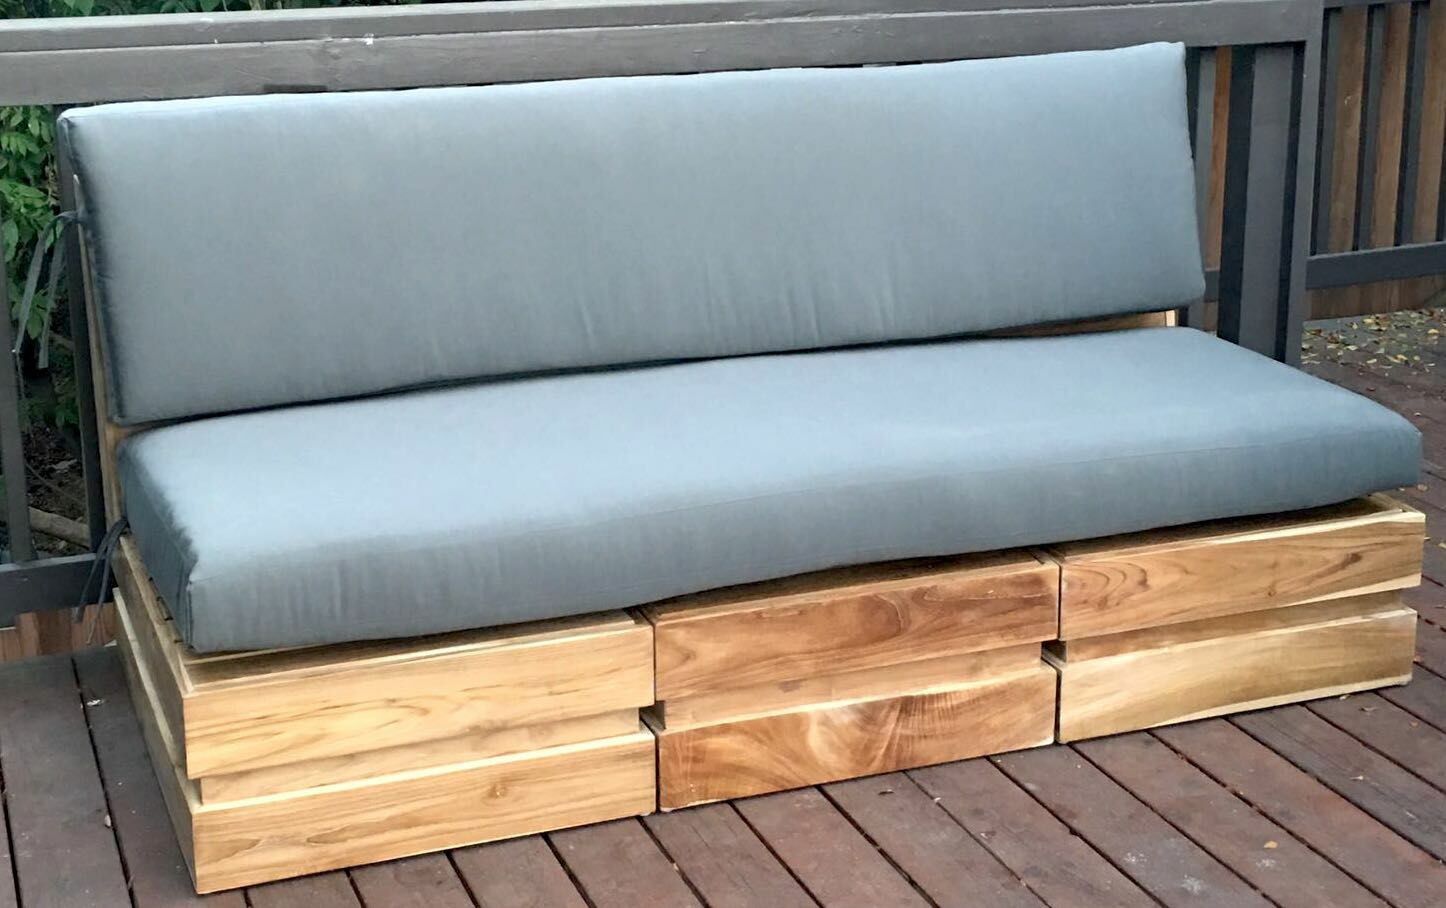 Seaside 5 Piece Teak Sunbrella Sofa Set with Cushions Fabric: Natural